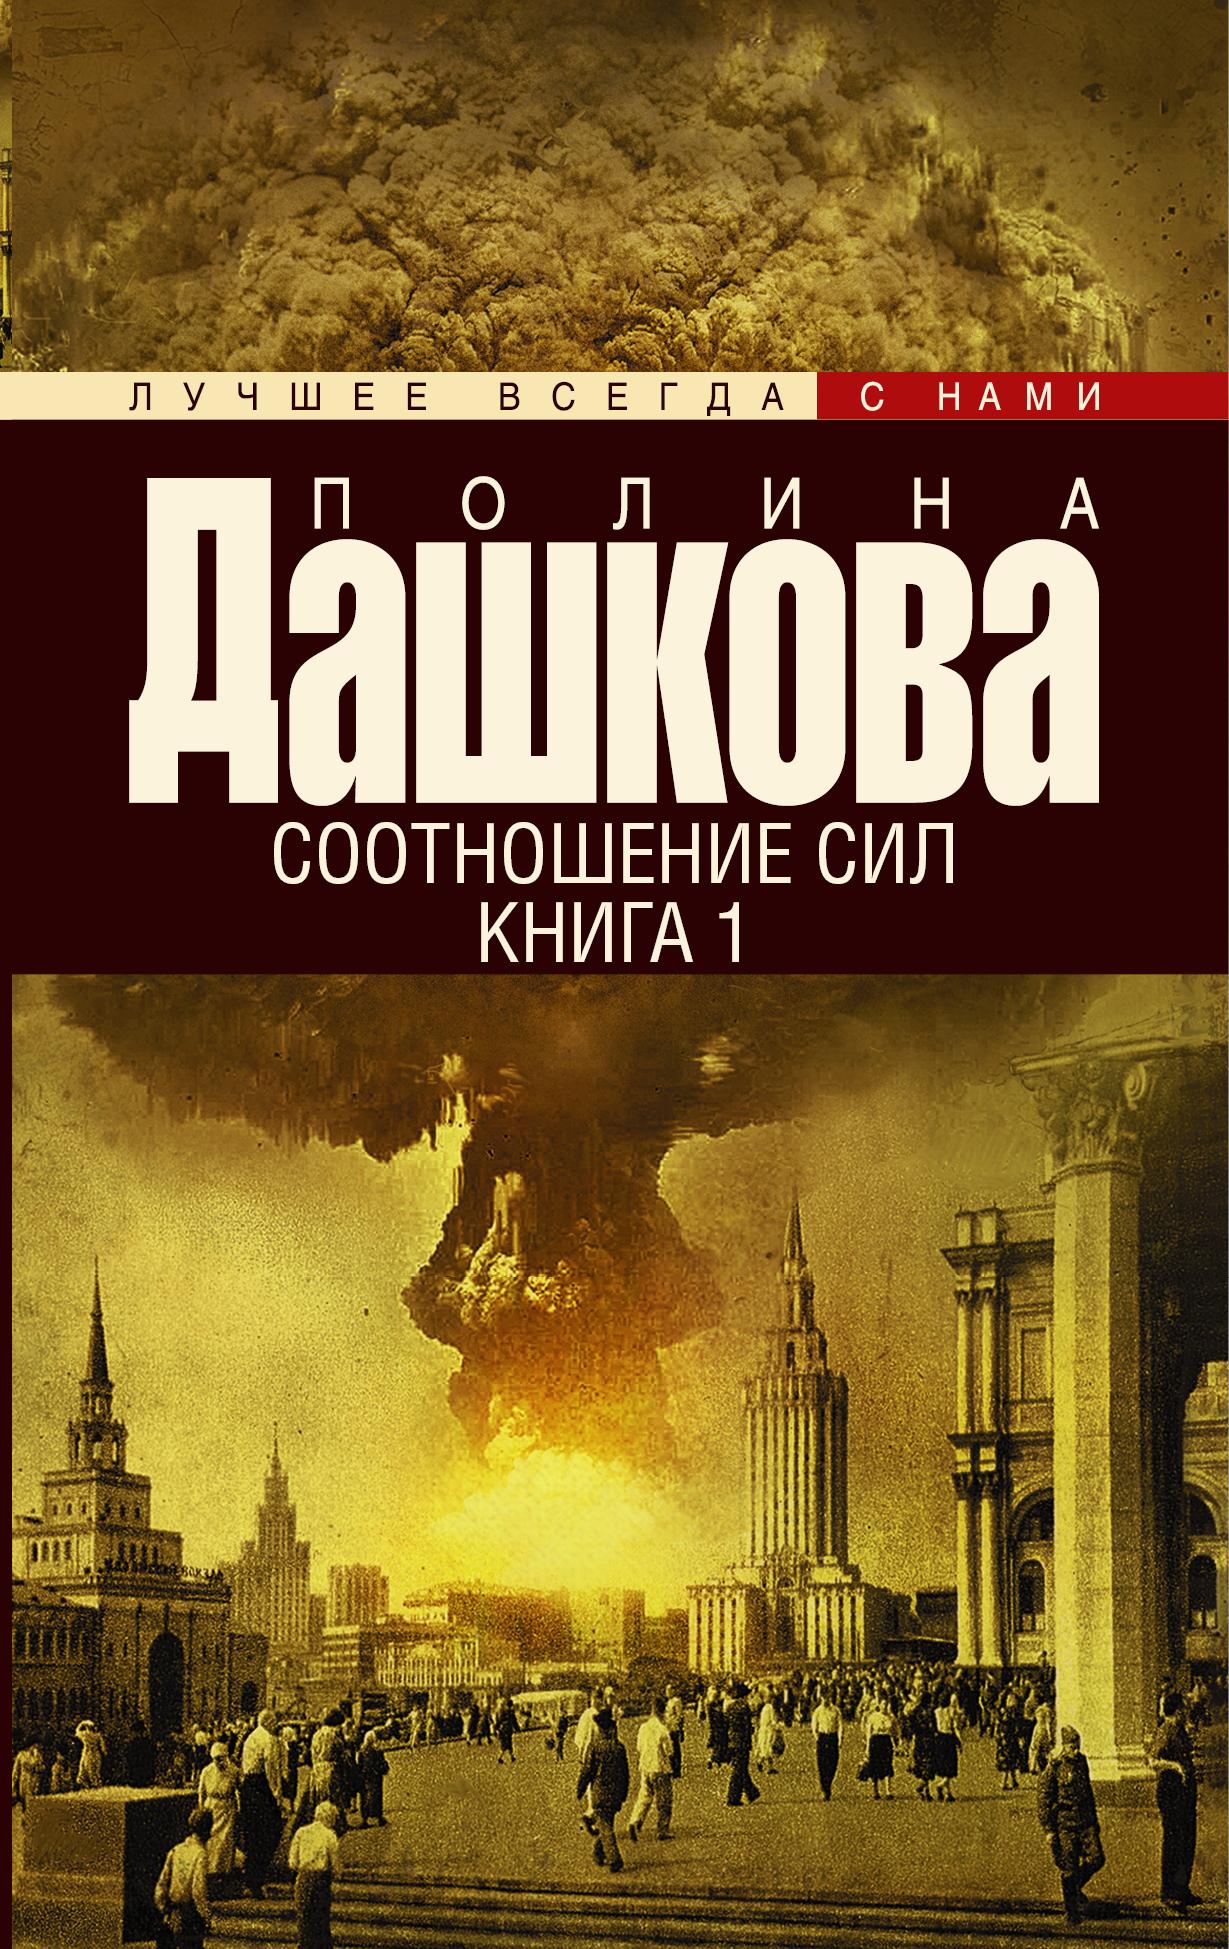 Дашкова П.В. Соотношение сил. Книга 1 дашкова п в соотношение сил